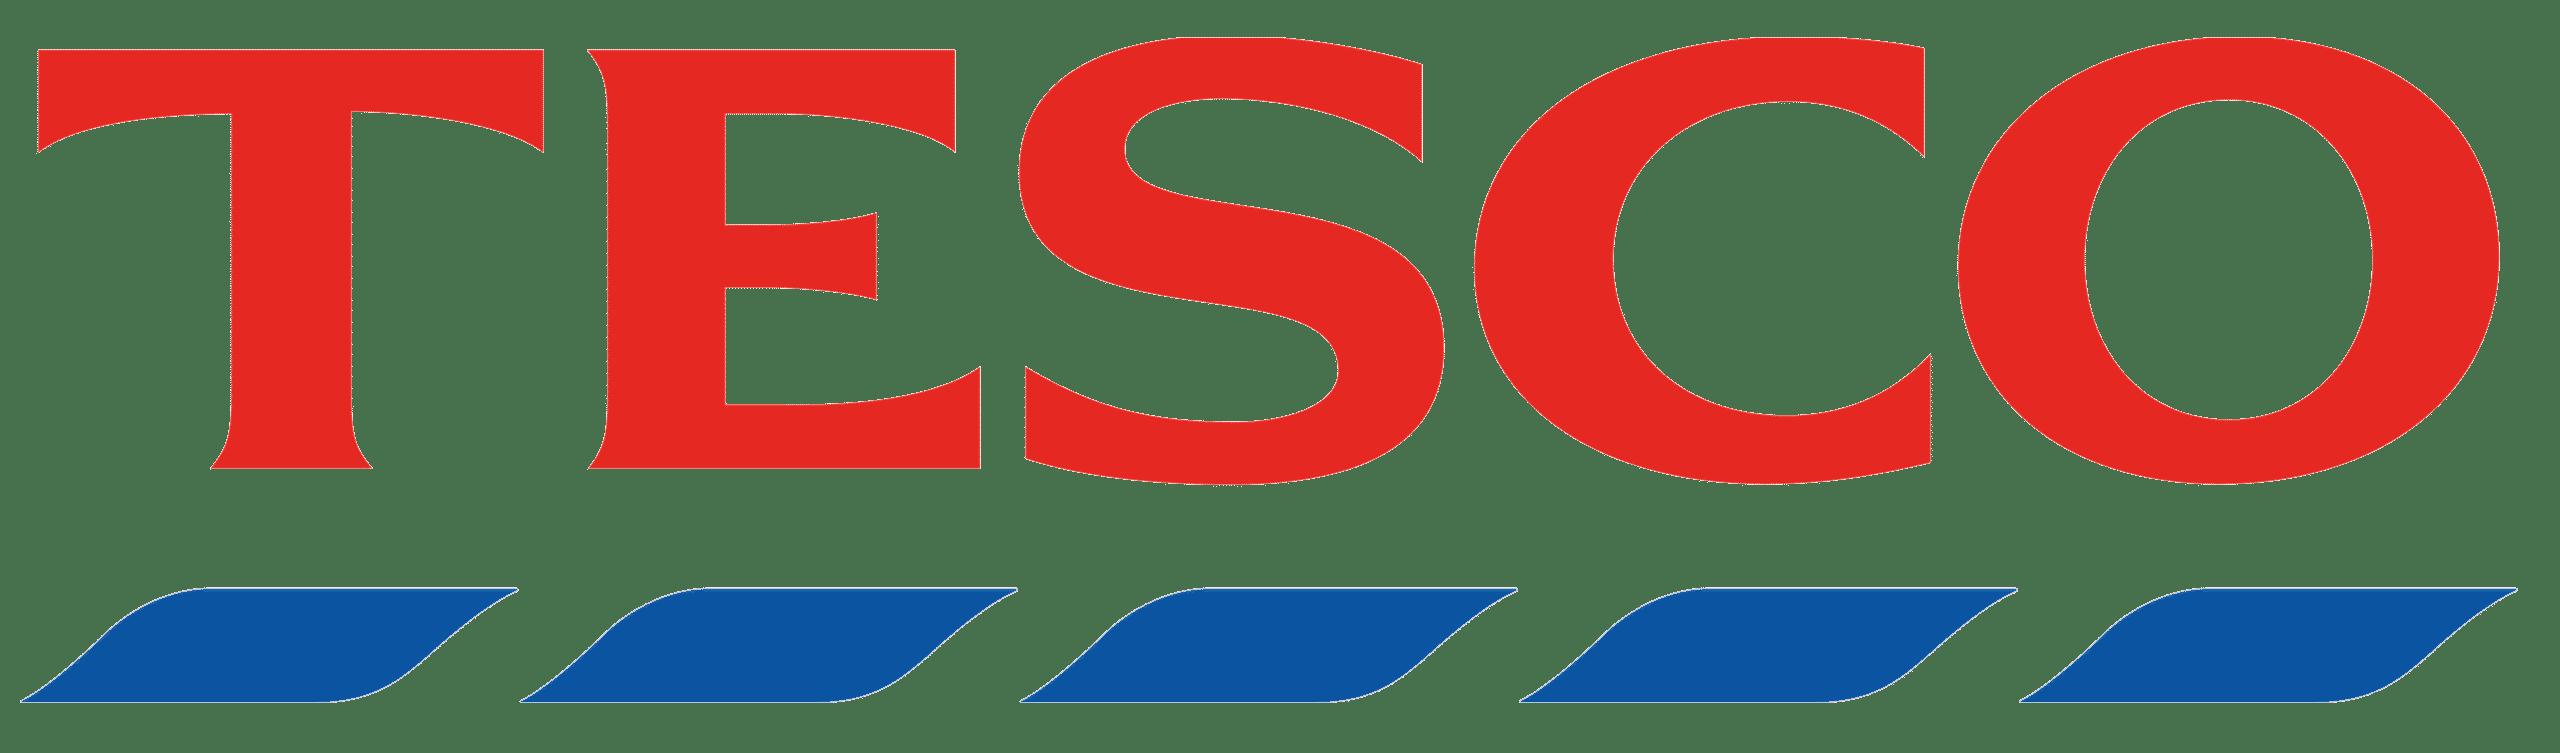 Tesco_logo_logotype